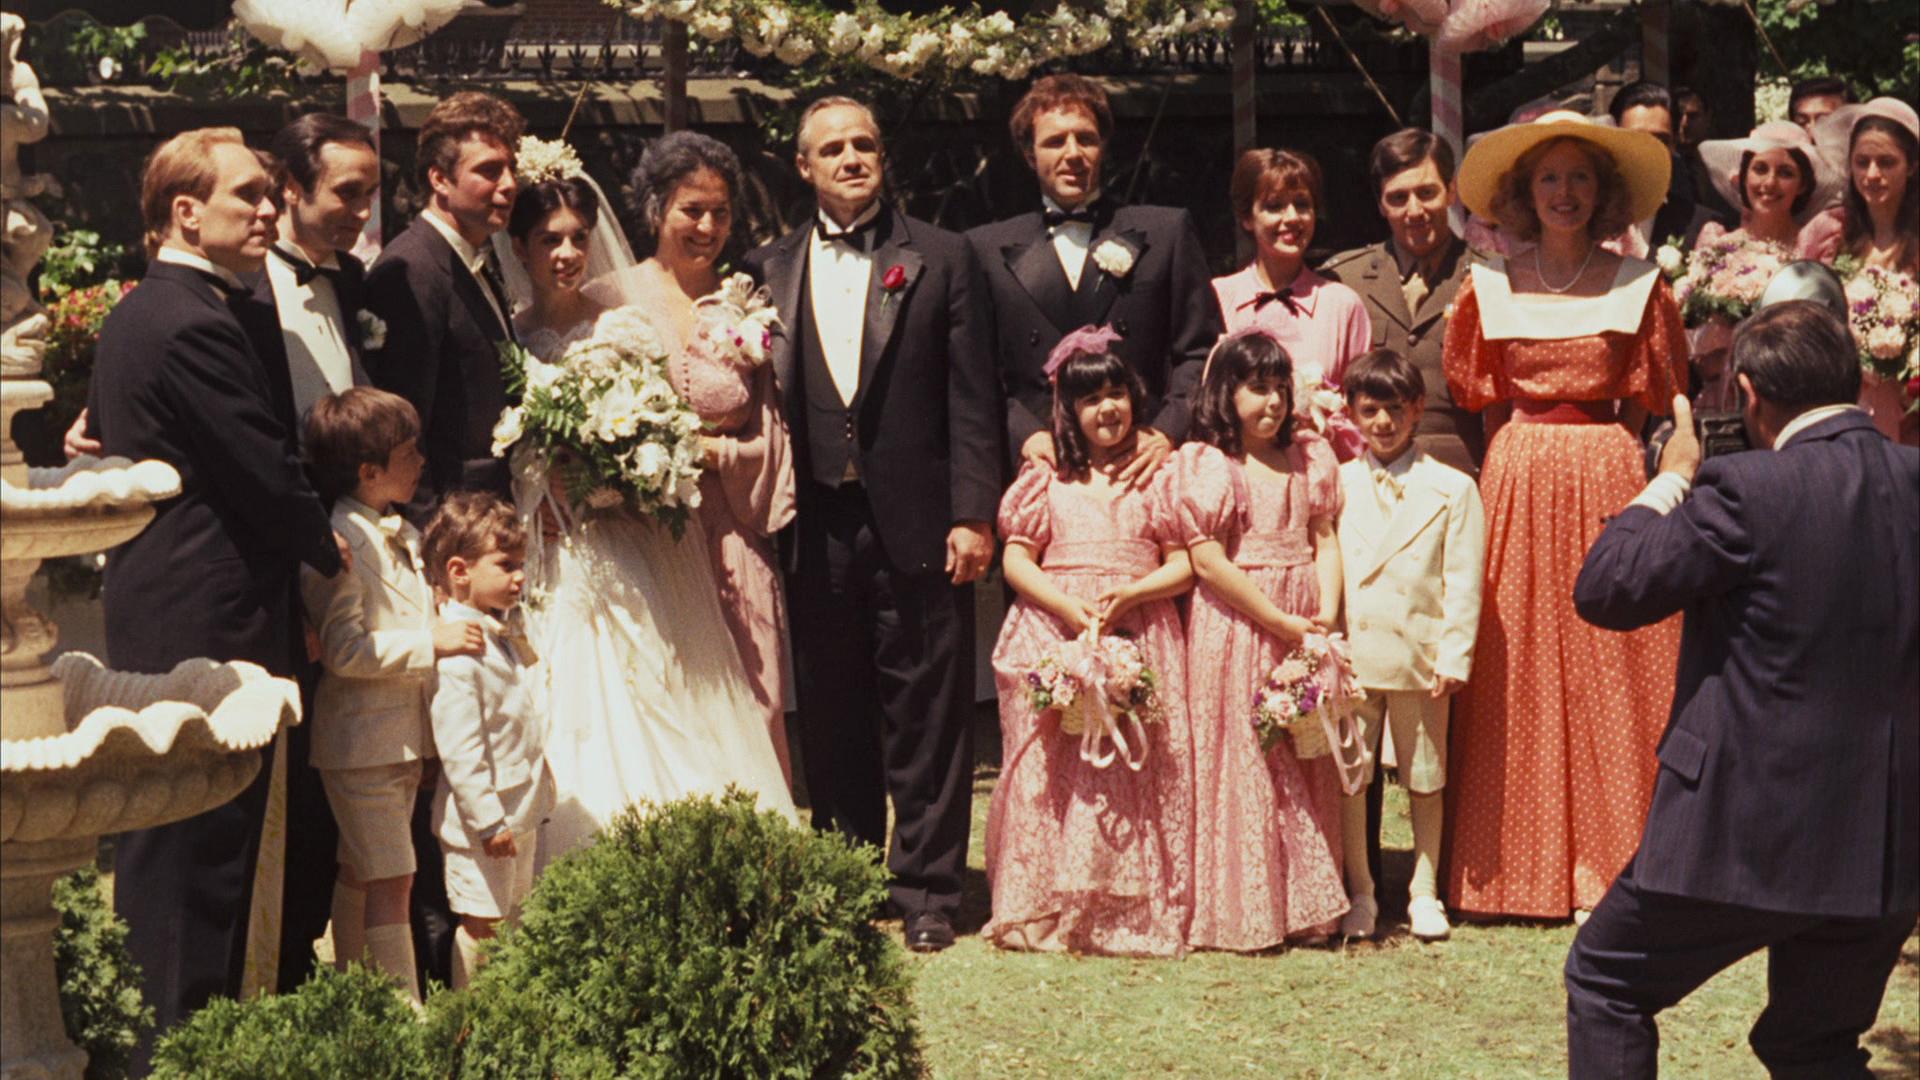 Corleone family the godfather wiki fandom powered by wikia altavistaventures Gallery